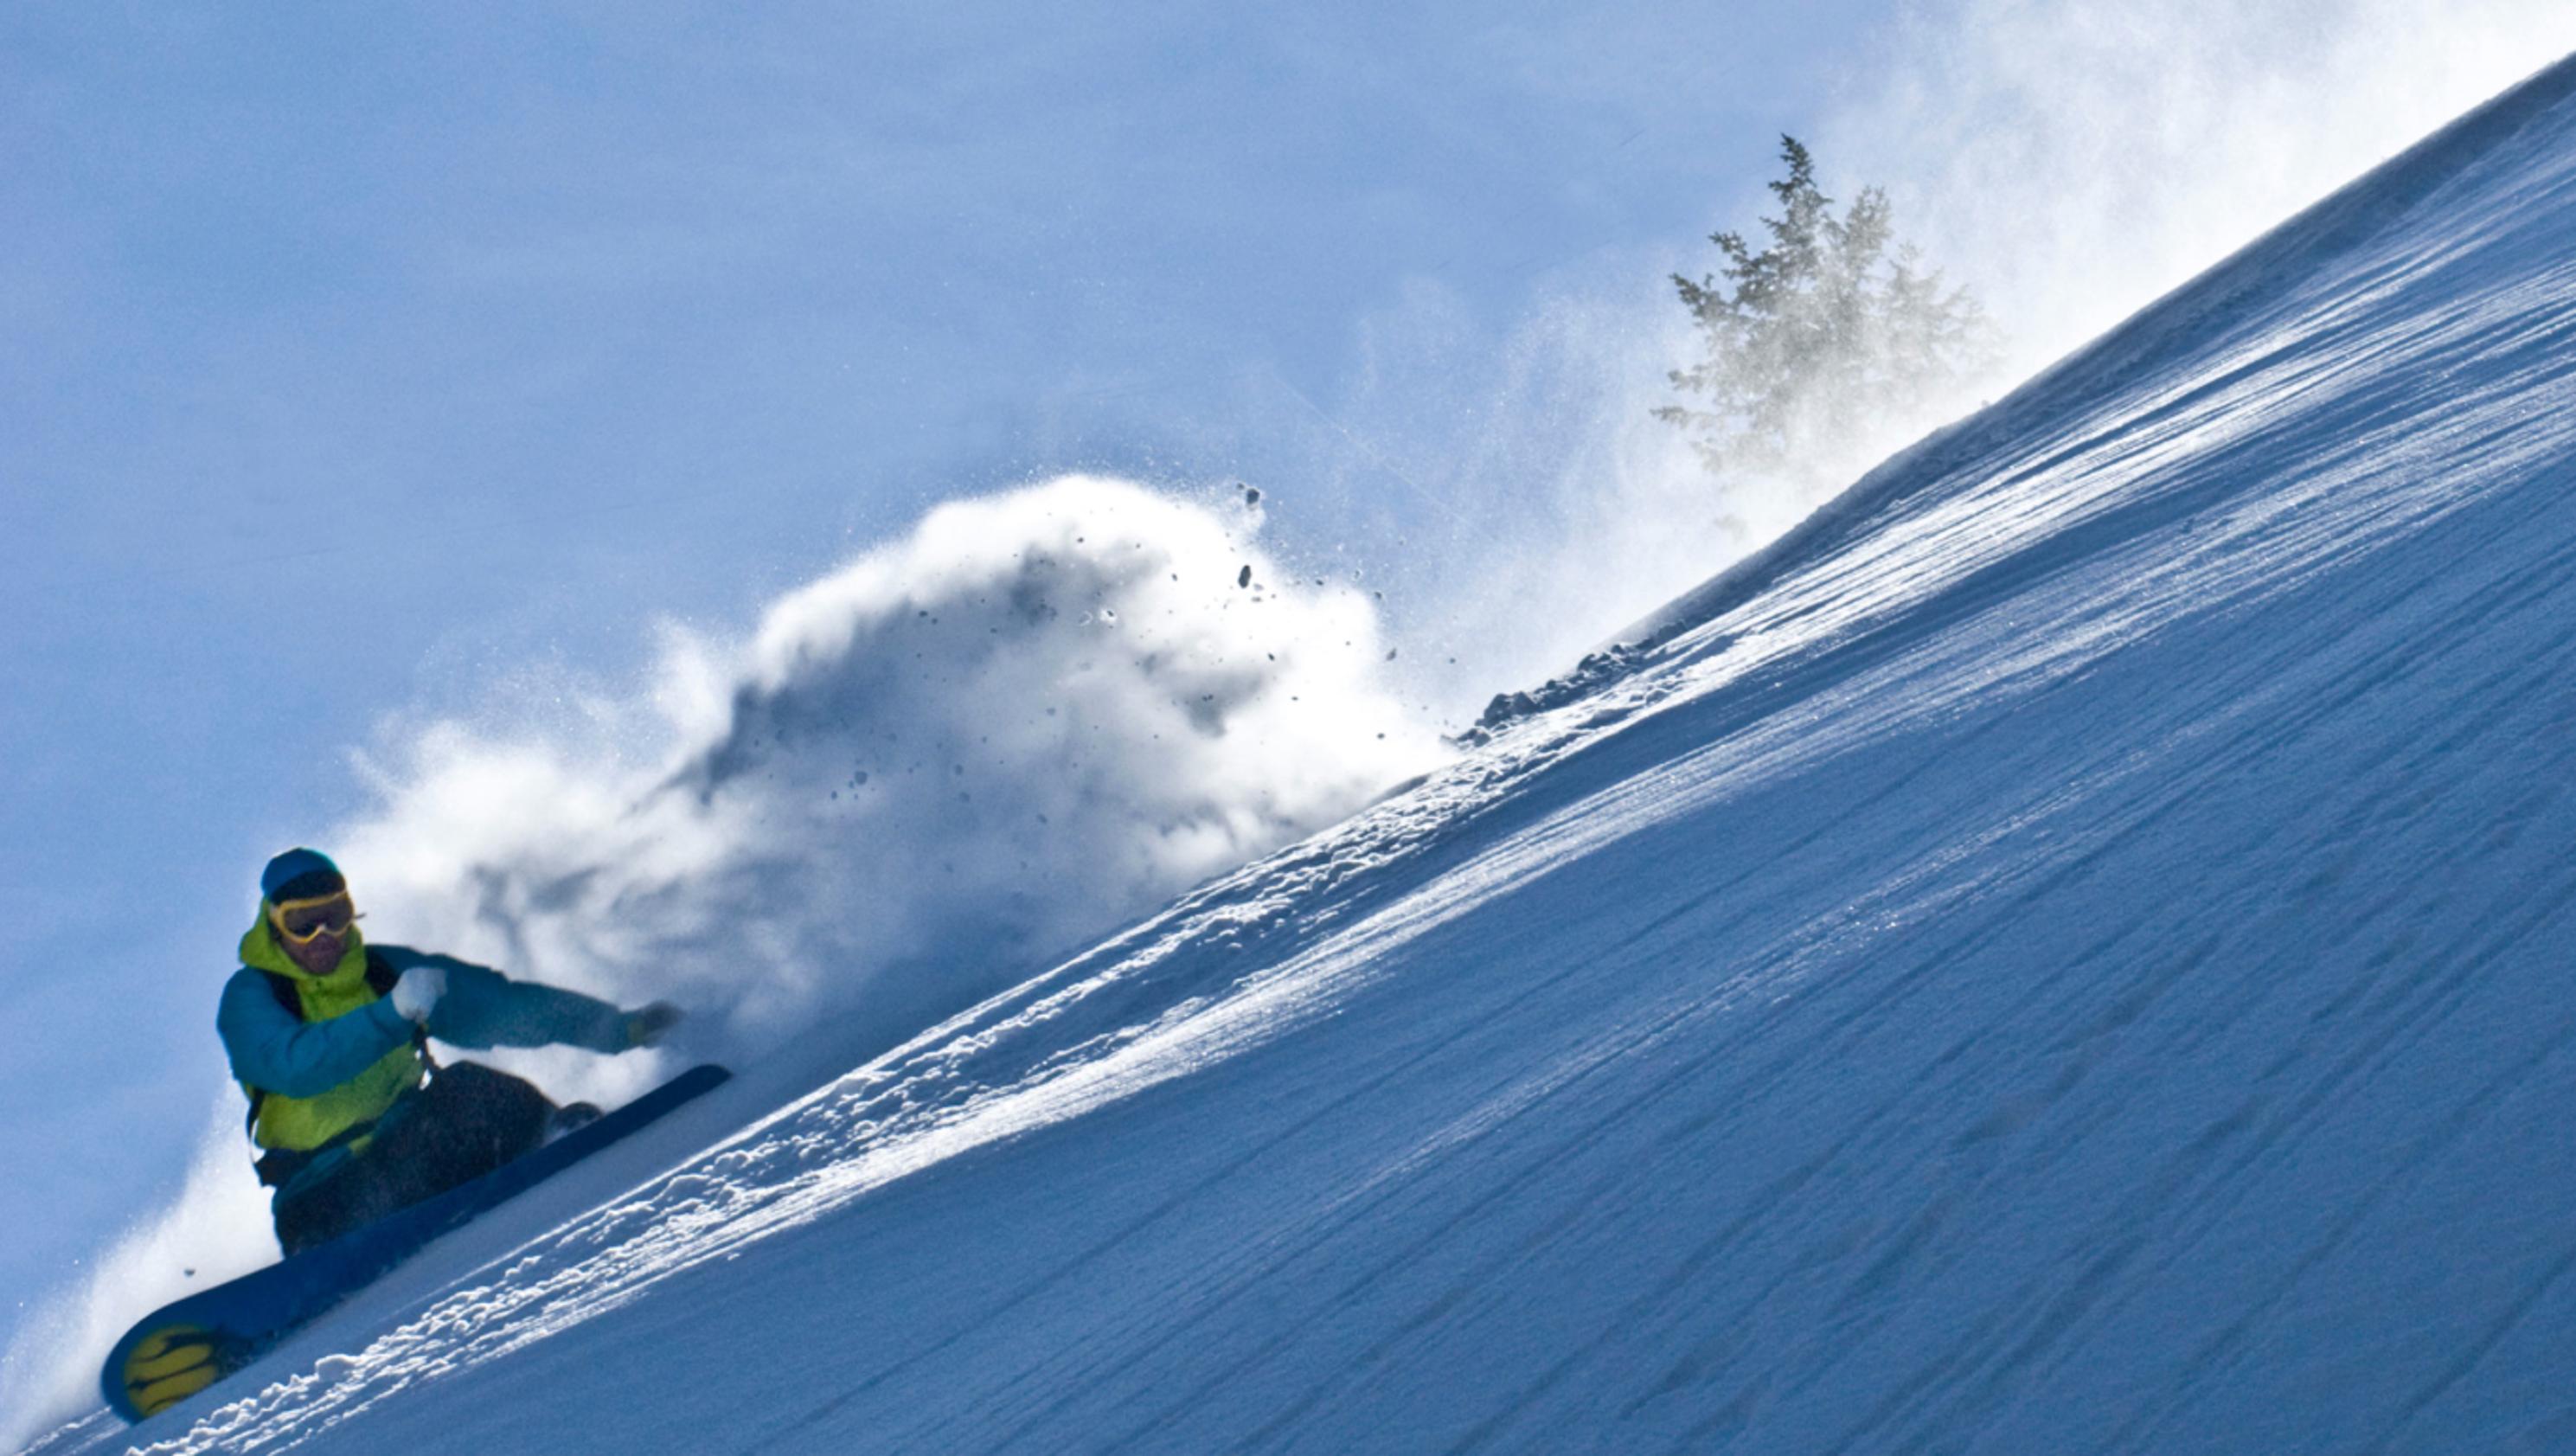 Ranking the 20 best ski resorts in North America